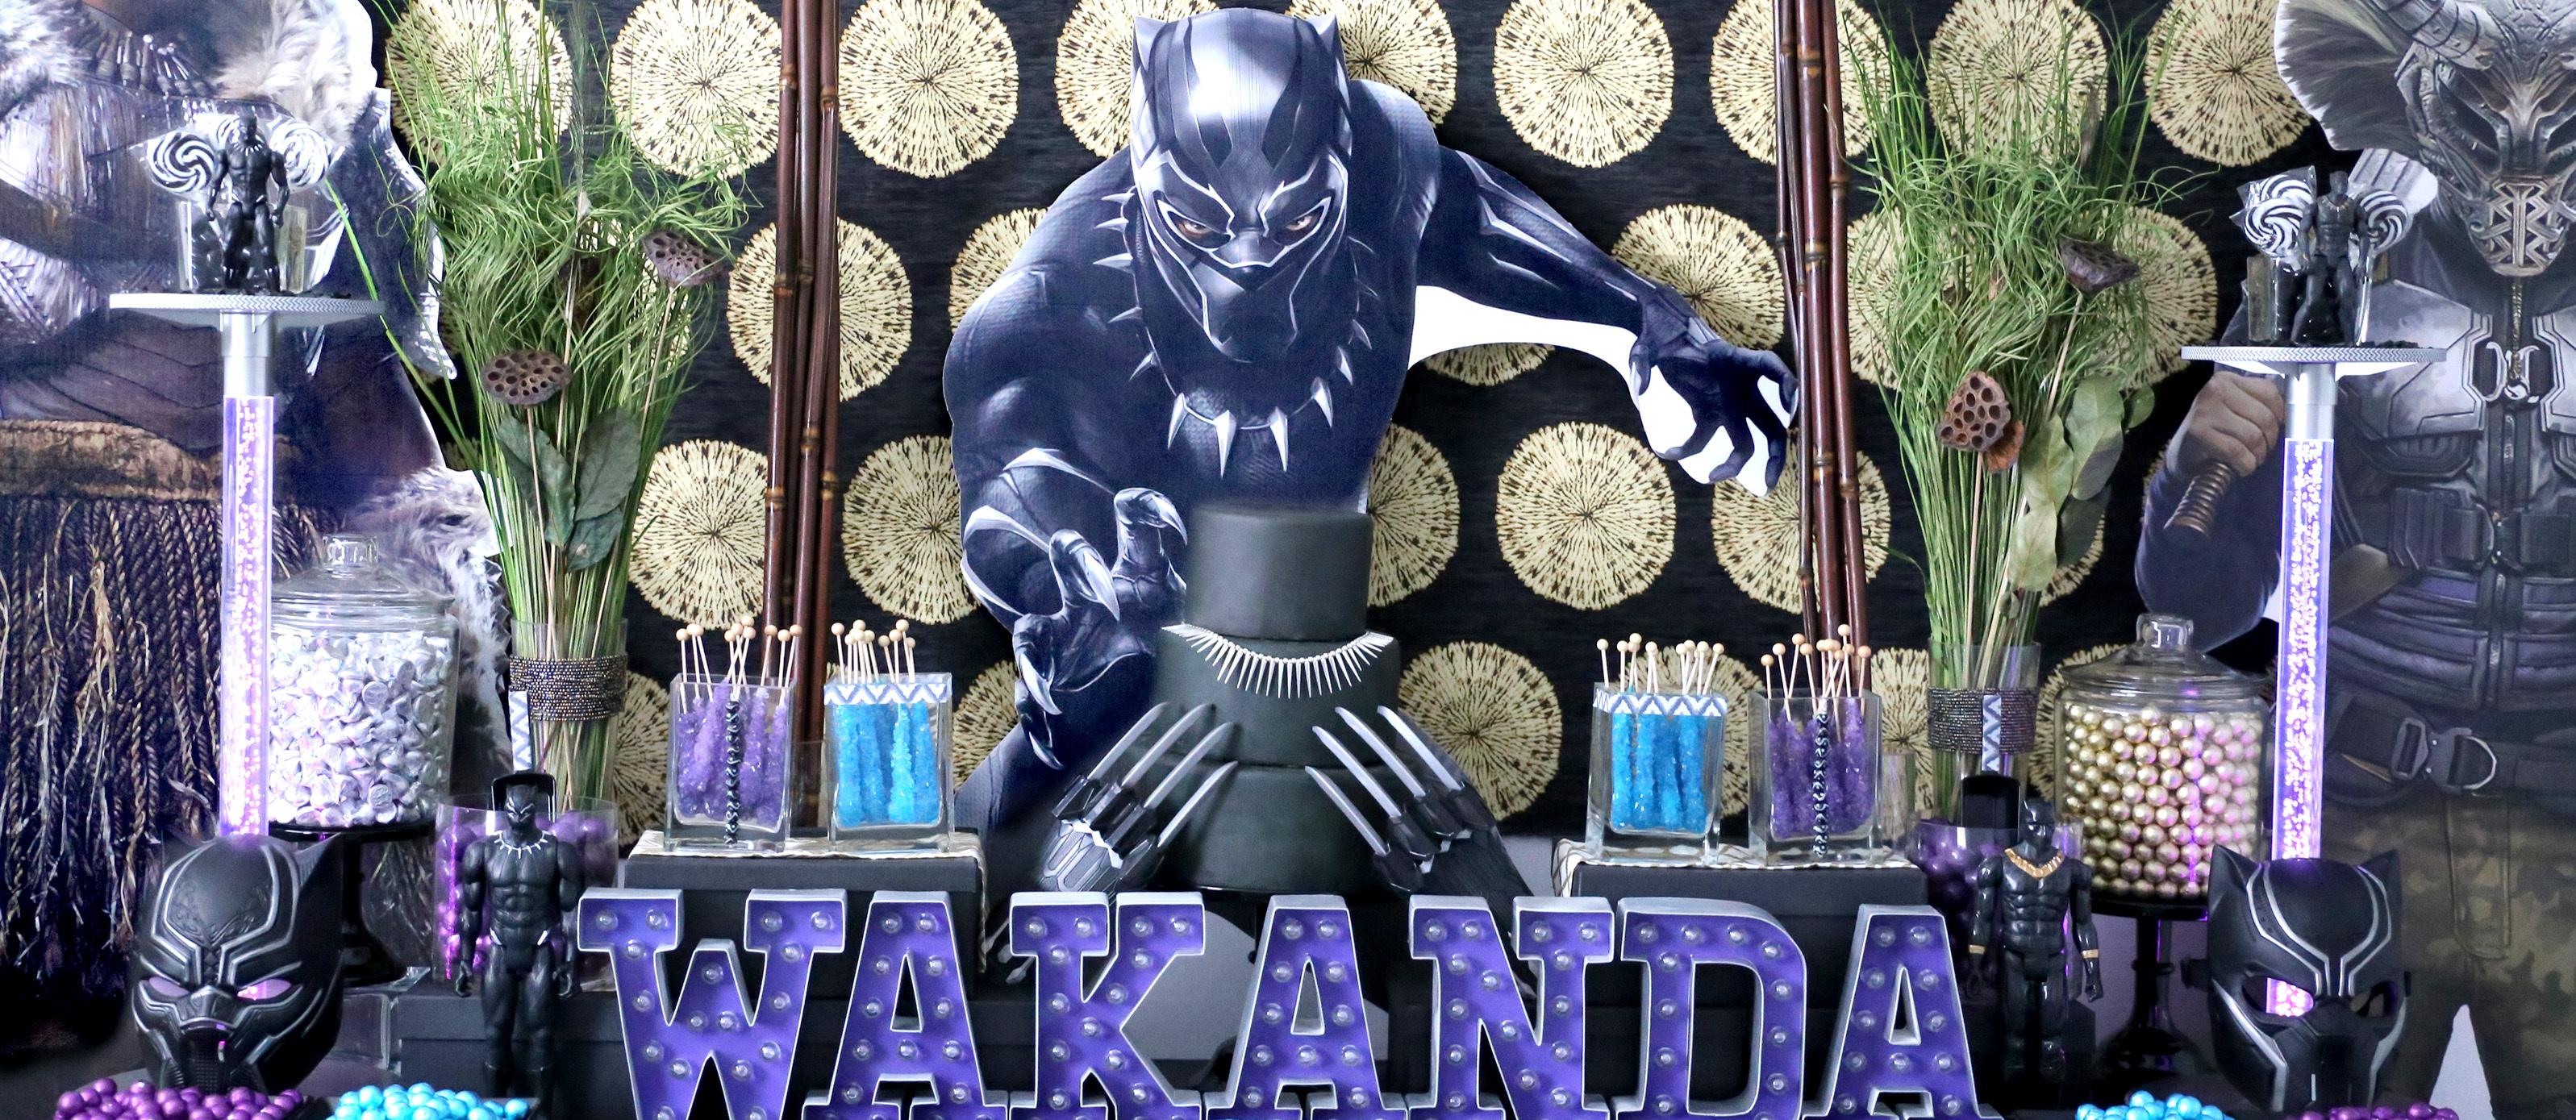 Black Panther Party Fun365